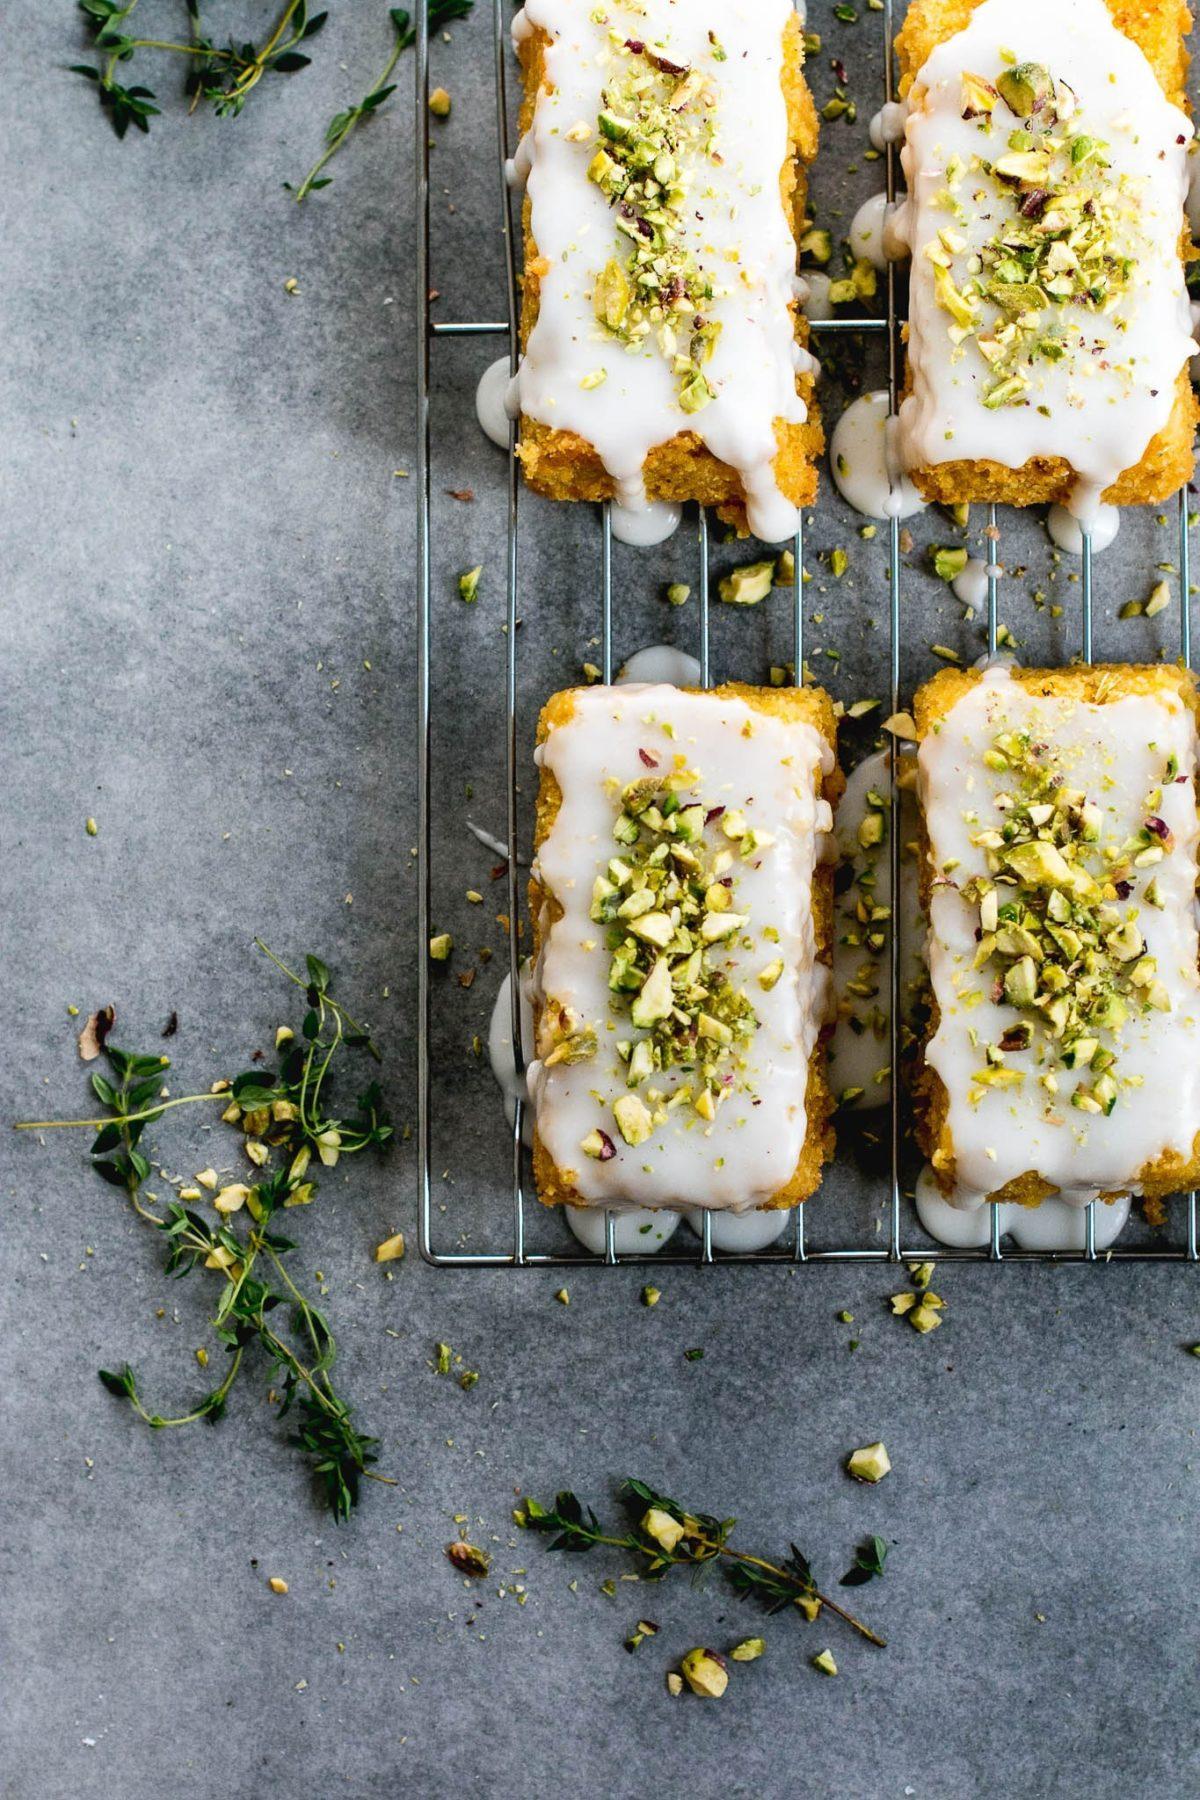 Lemon Polenta Pistachio Cakes